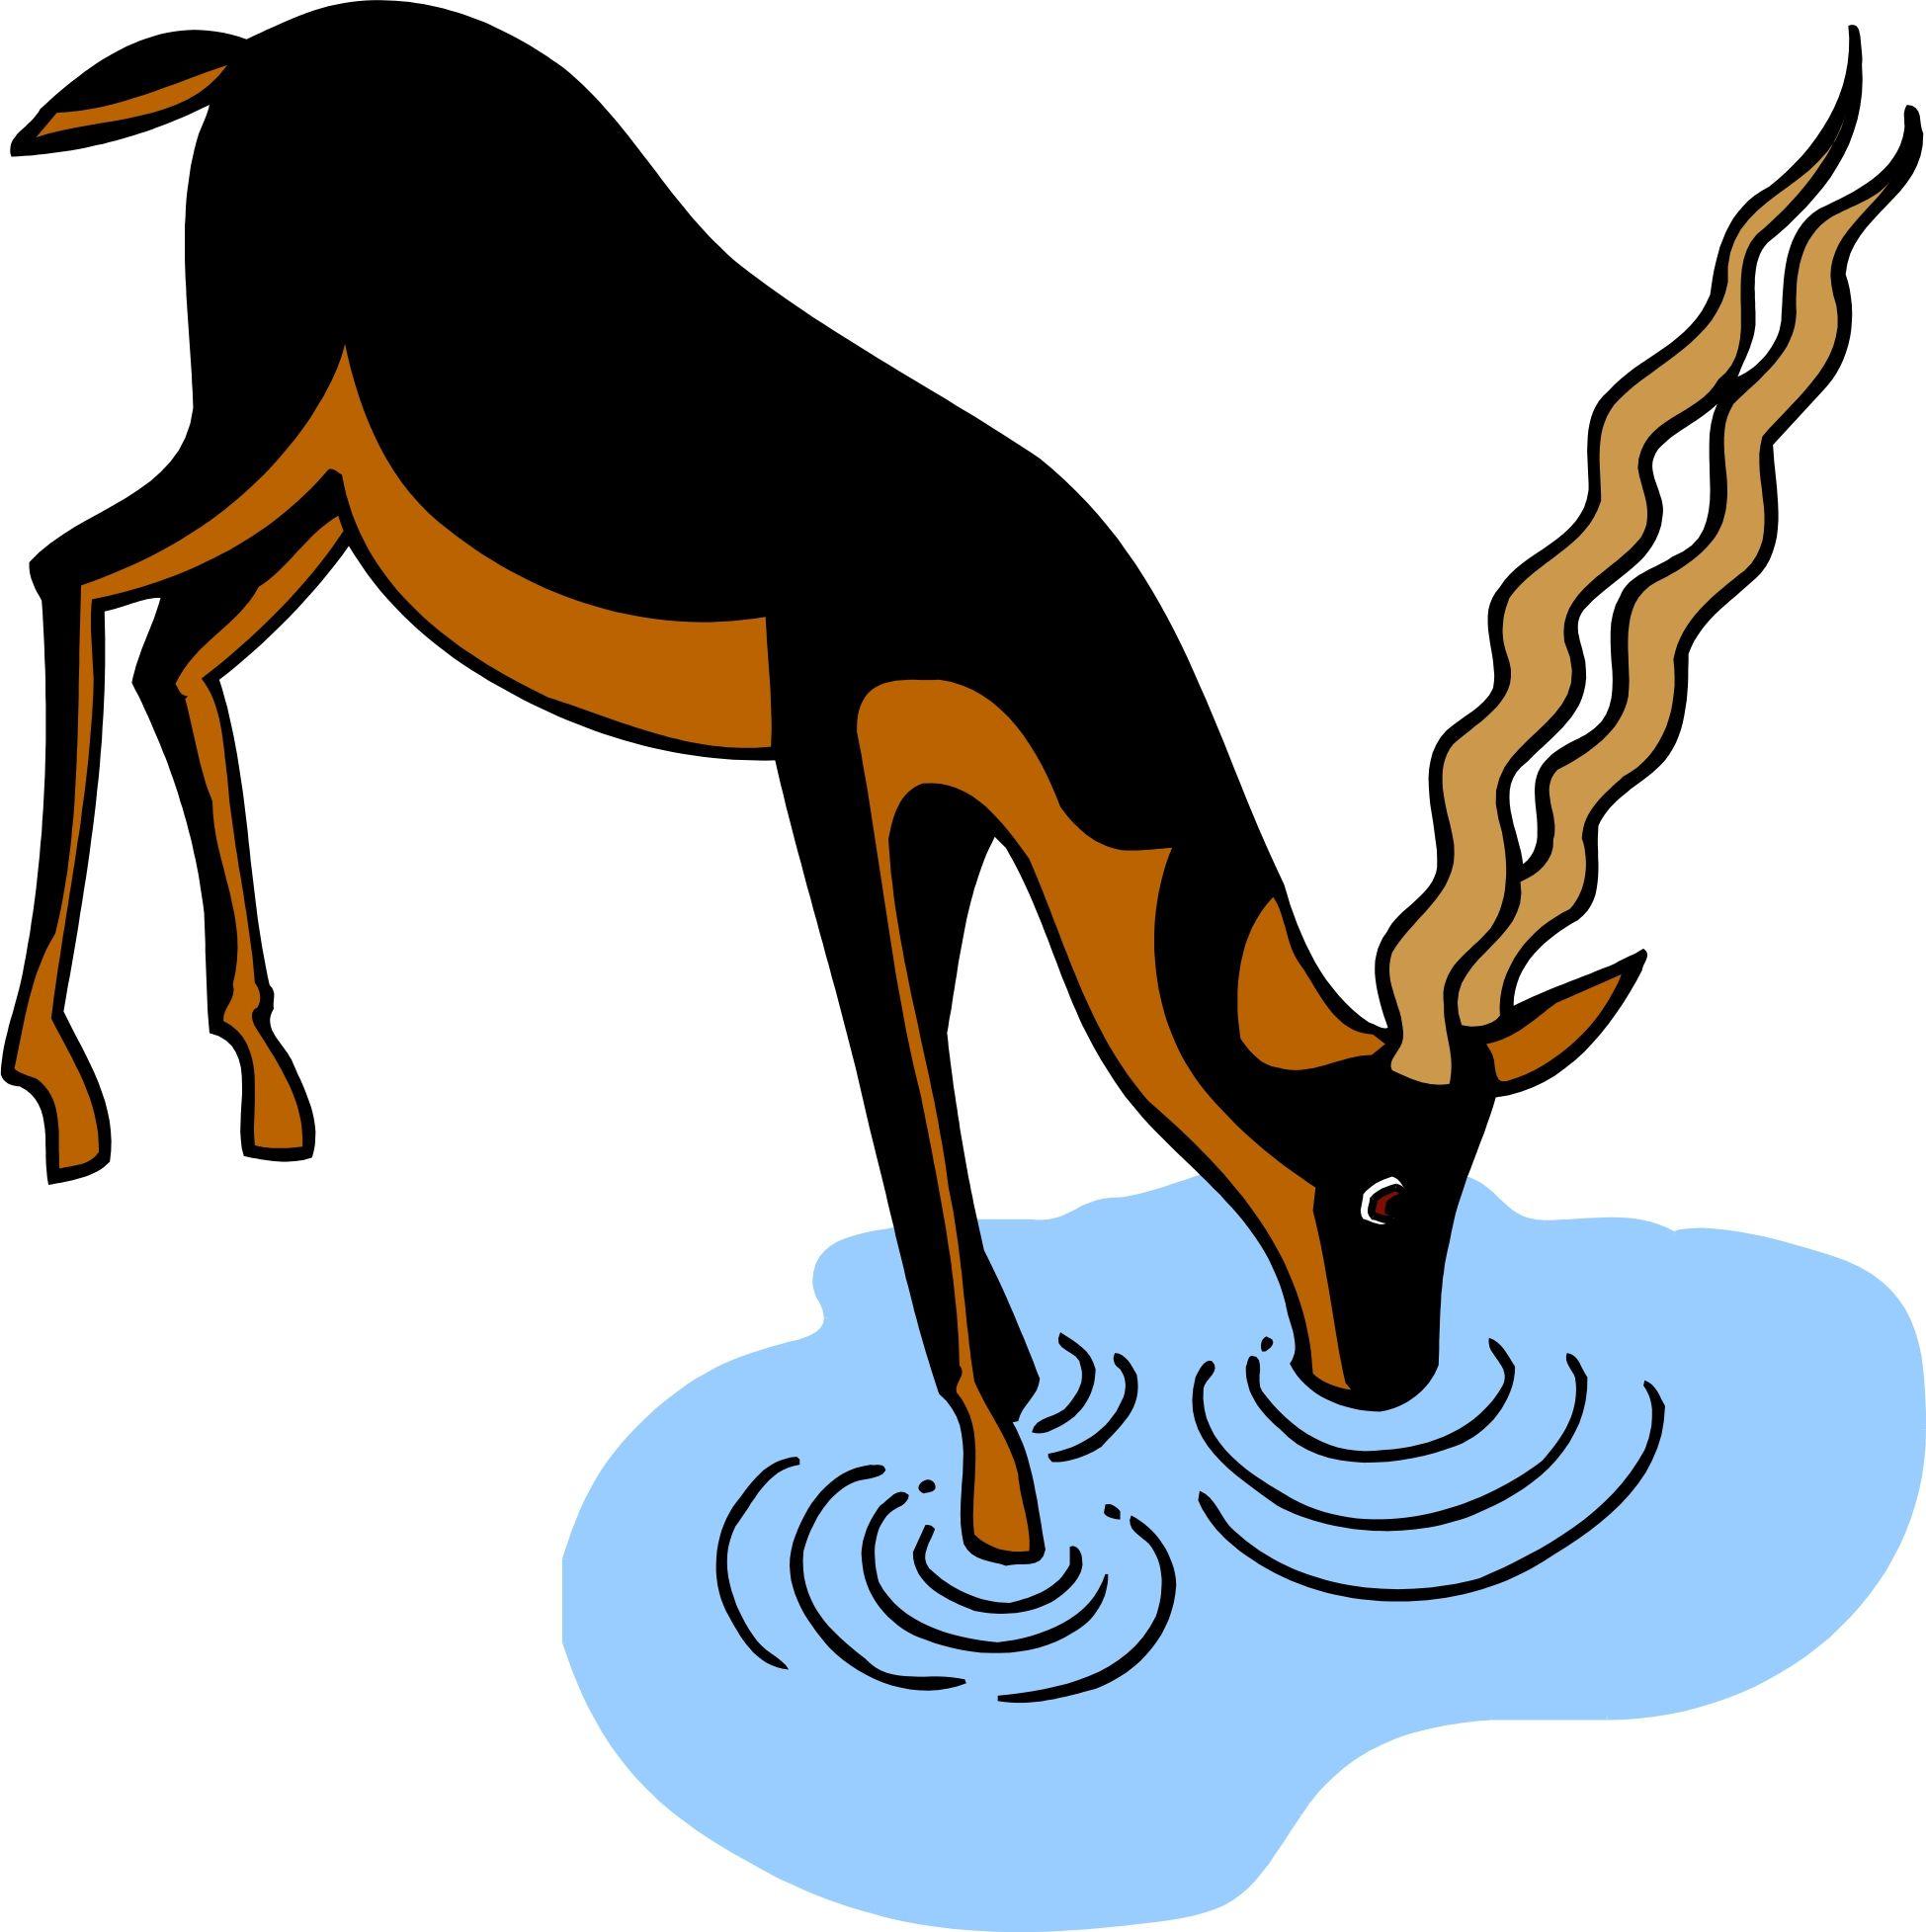 Deer drinking water clipart.